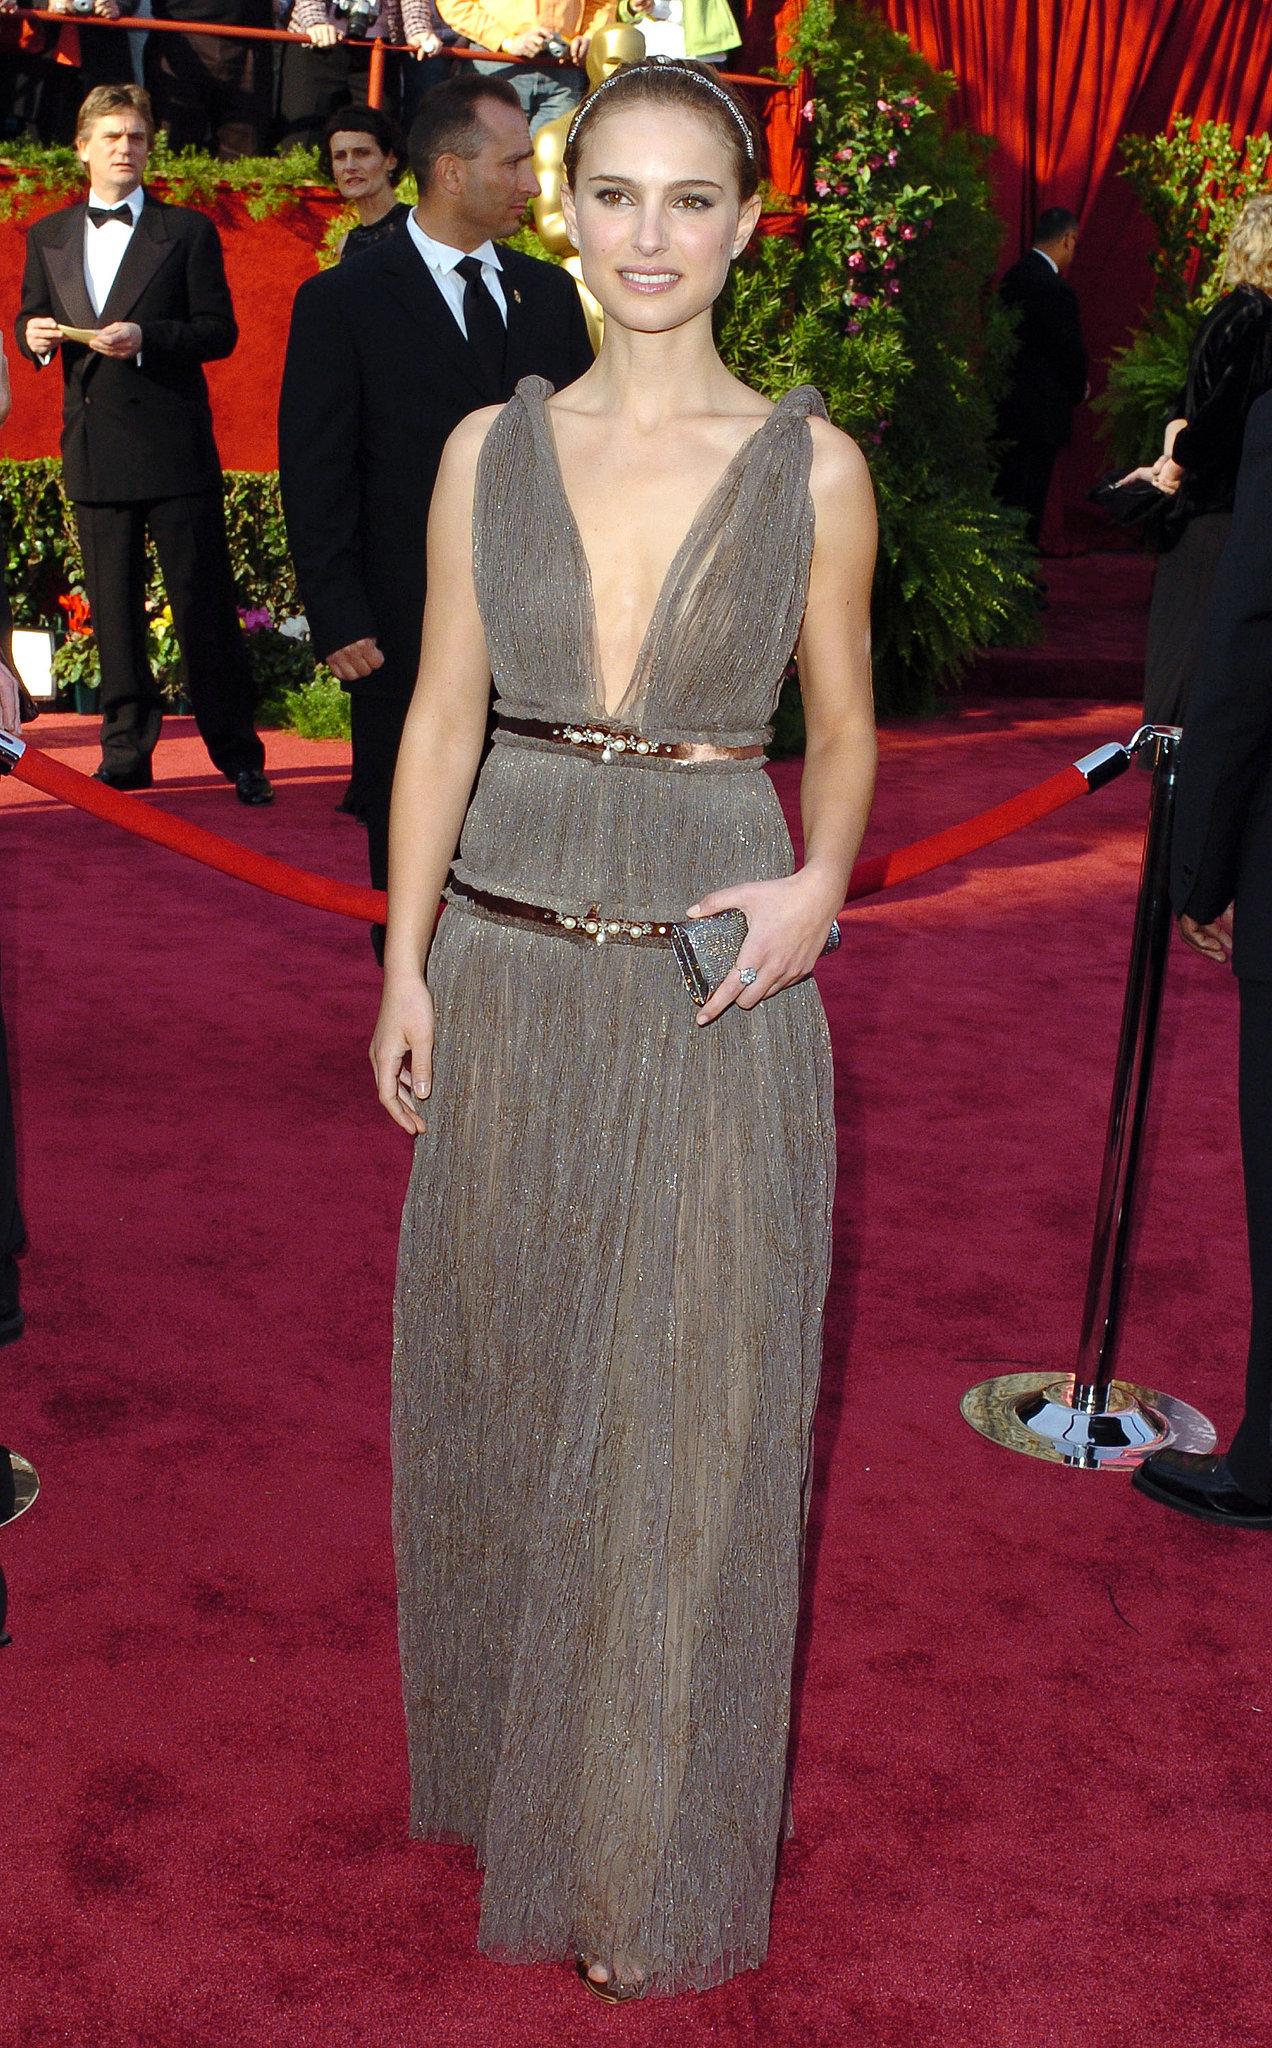 Natalie Portman At The 2005 Academy Awards 30 Iconic